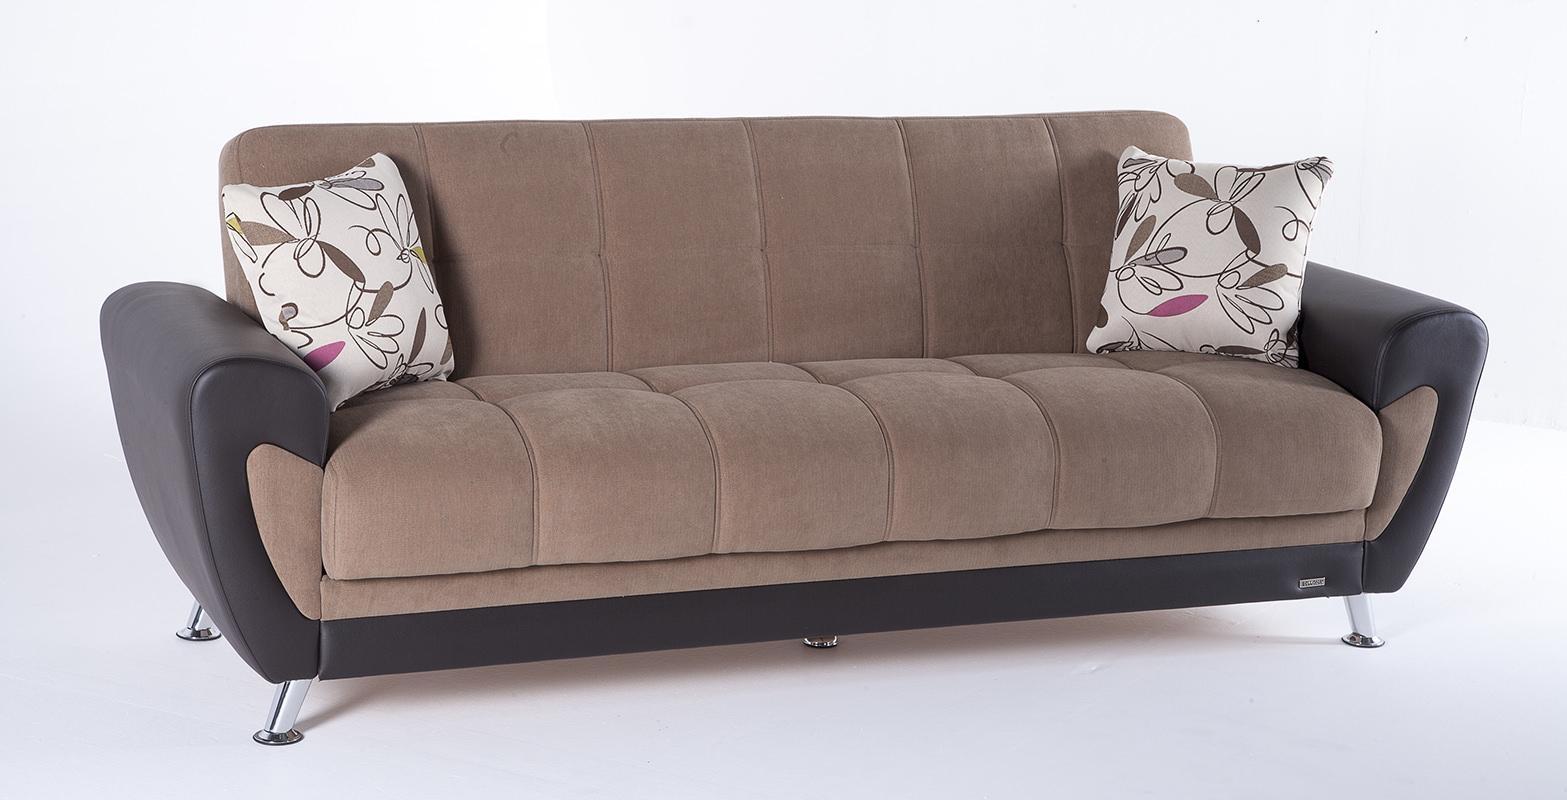 Duru Optimum Brown Convertible Sofa Bedsunset Regarding Sofa Bed Chairs (Image 5 of 20)